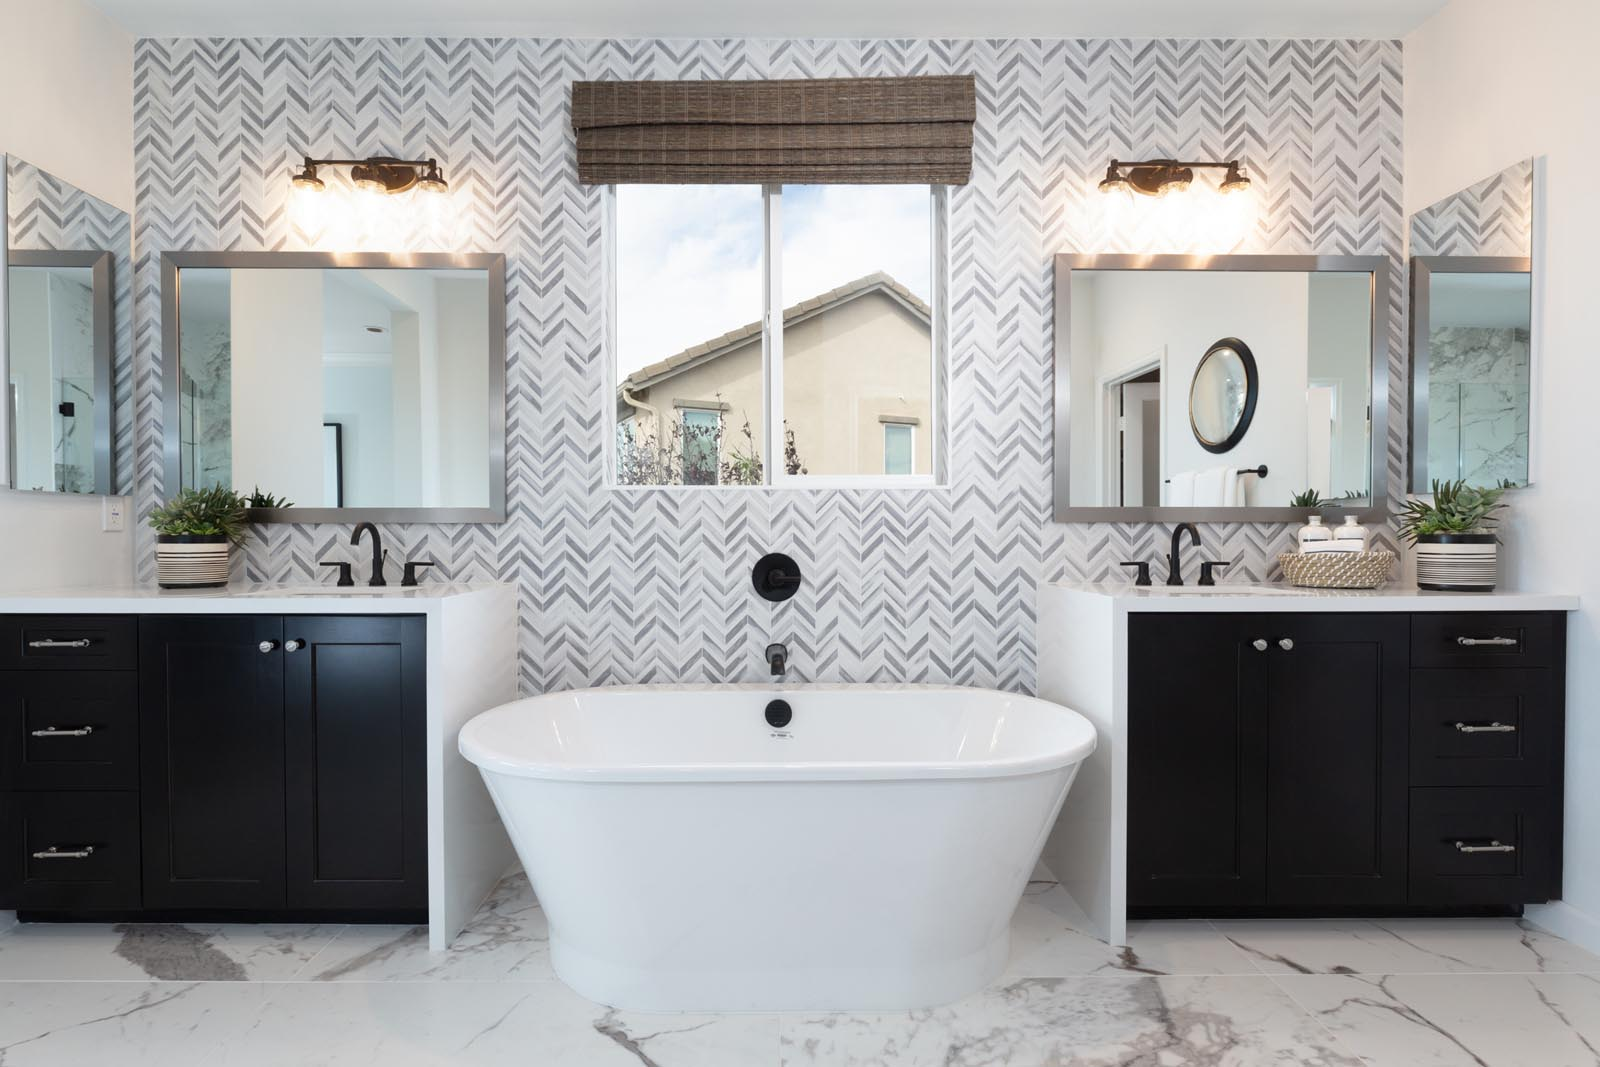 Everview Plan 4 Master Bathroom